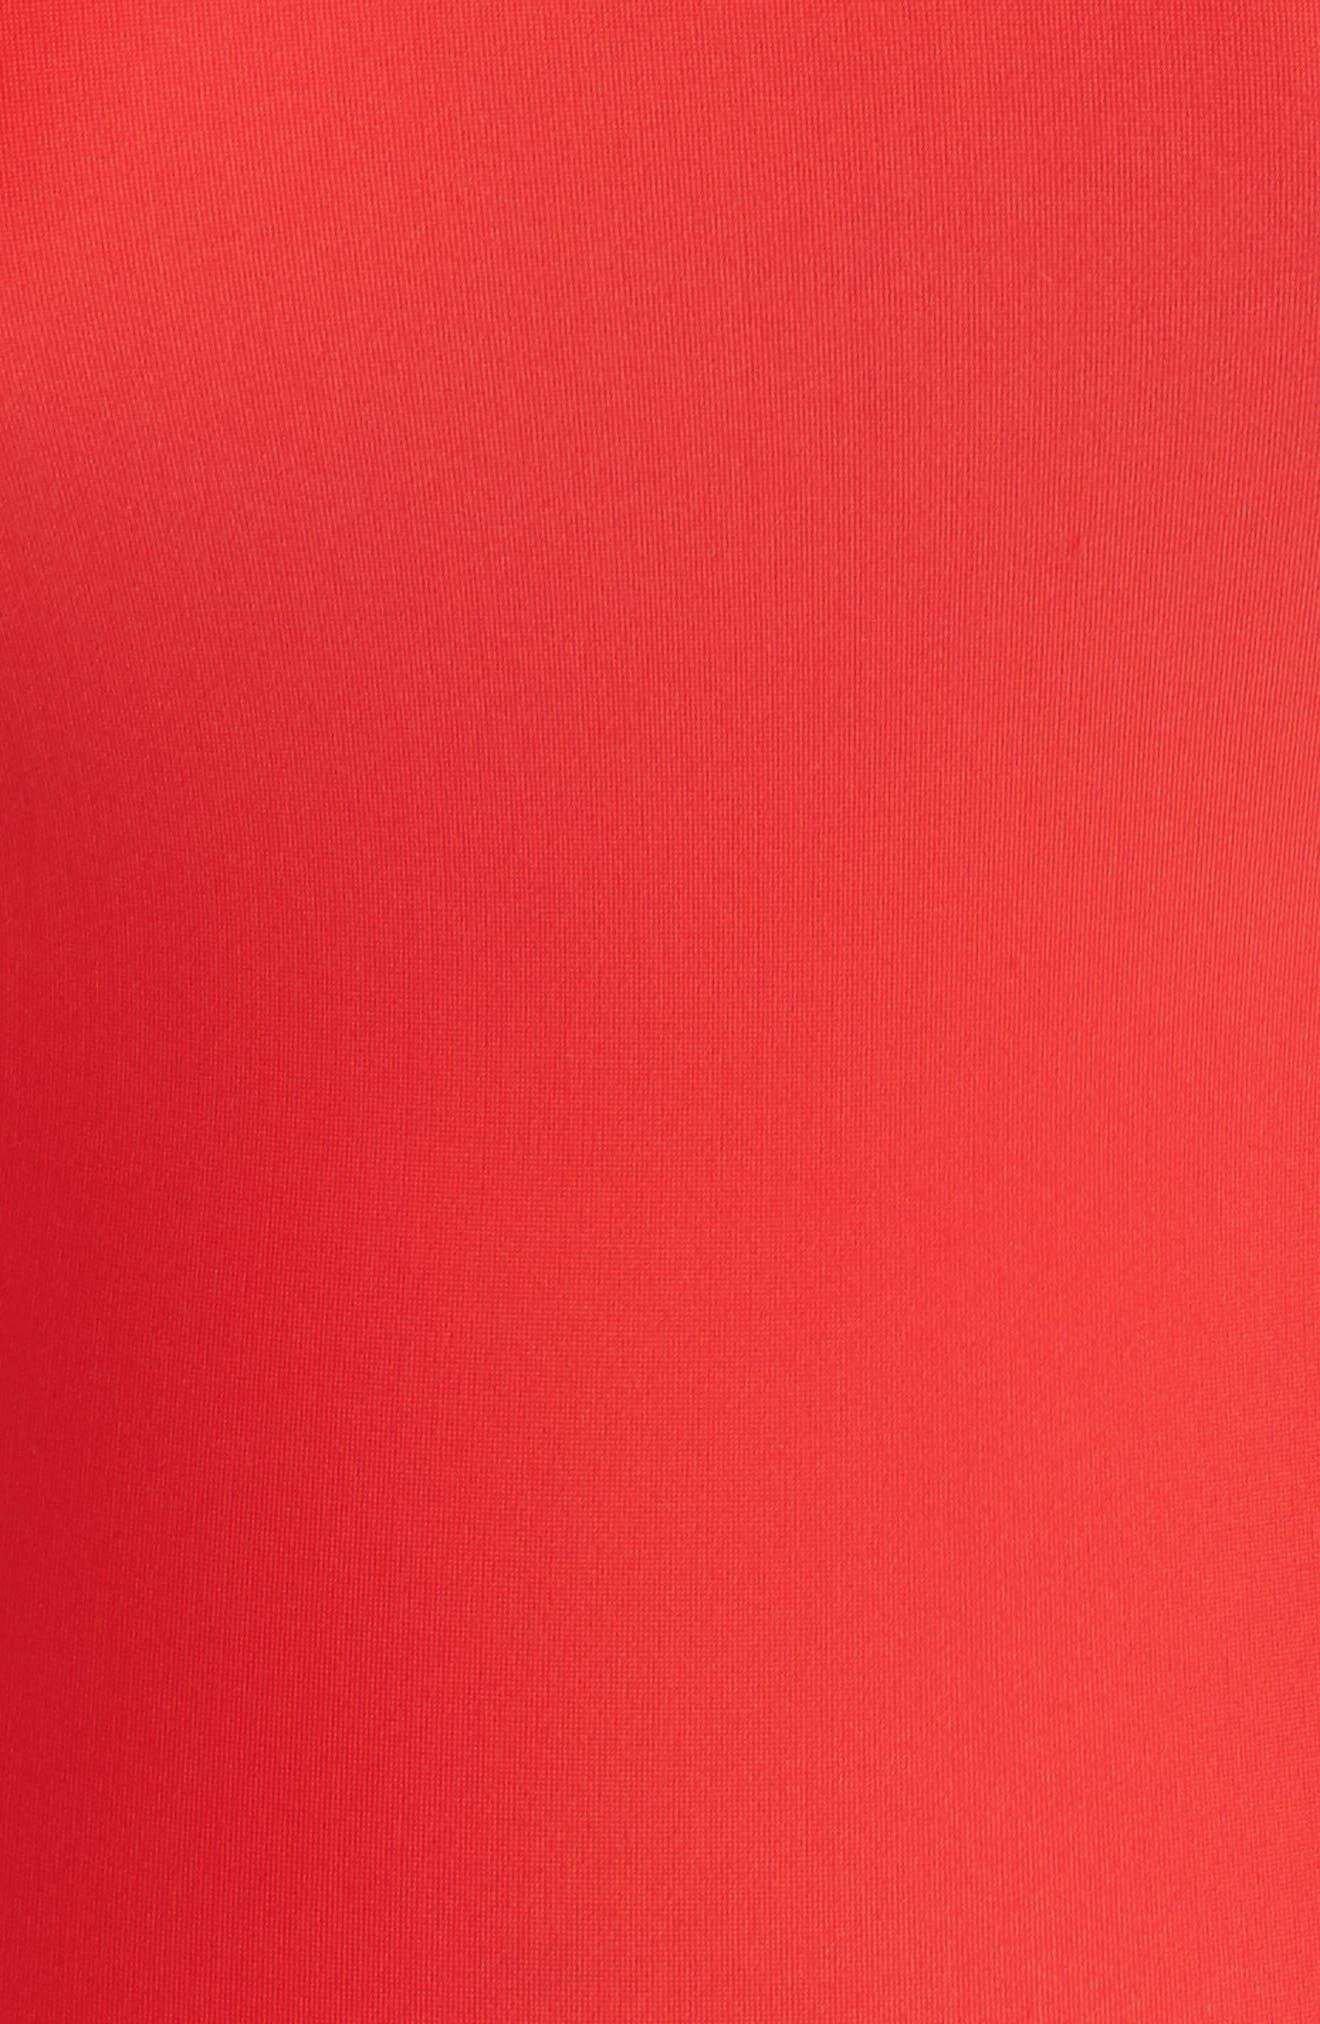 Saldana One-Piece Swimsuit,                             Alternate thumbnail 5, color,                             Red